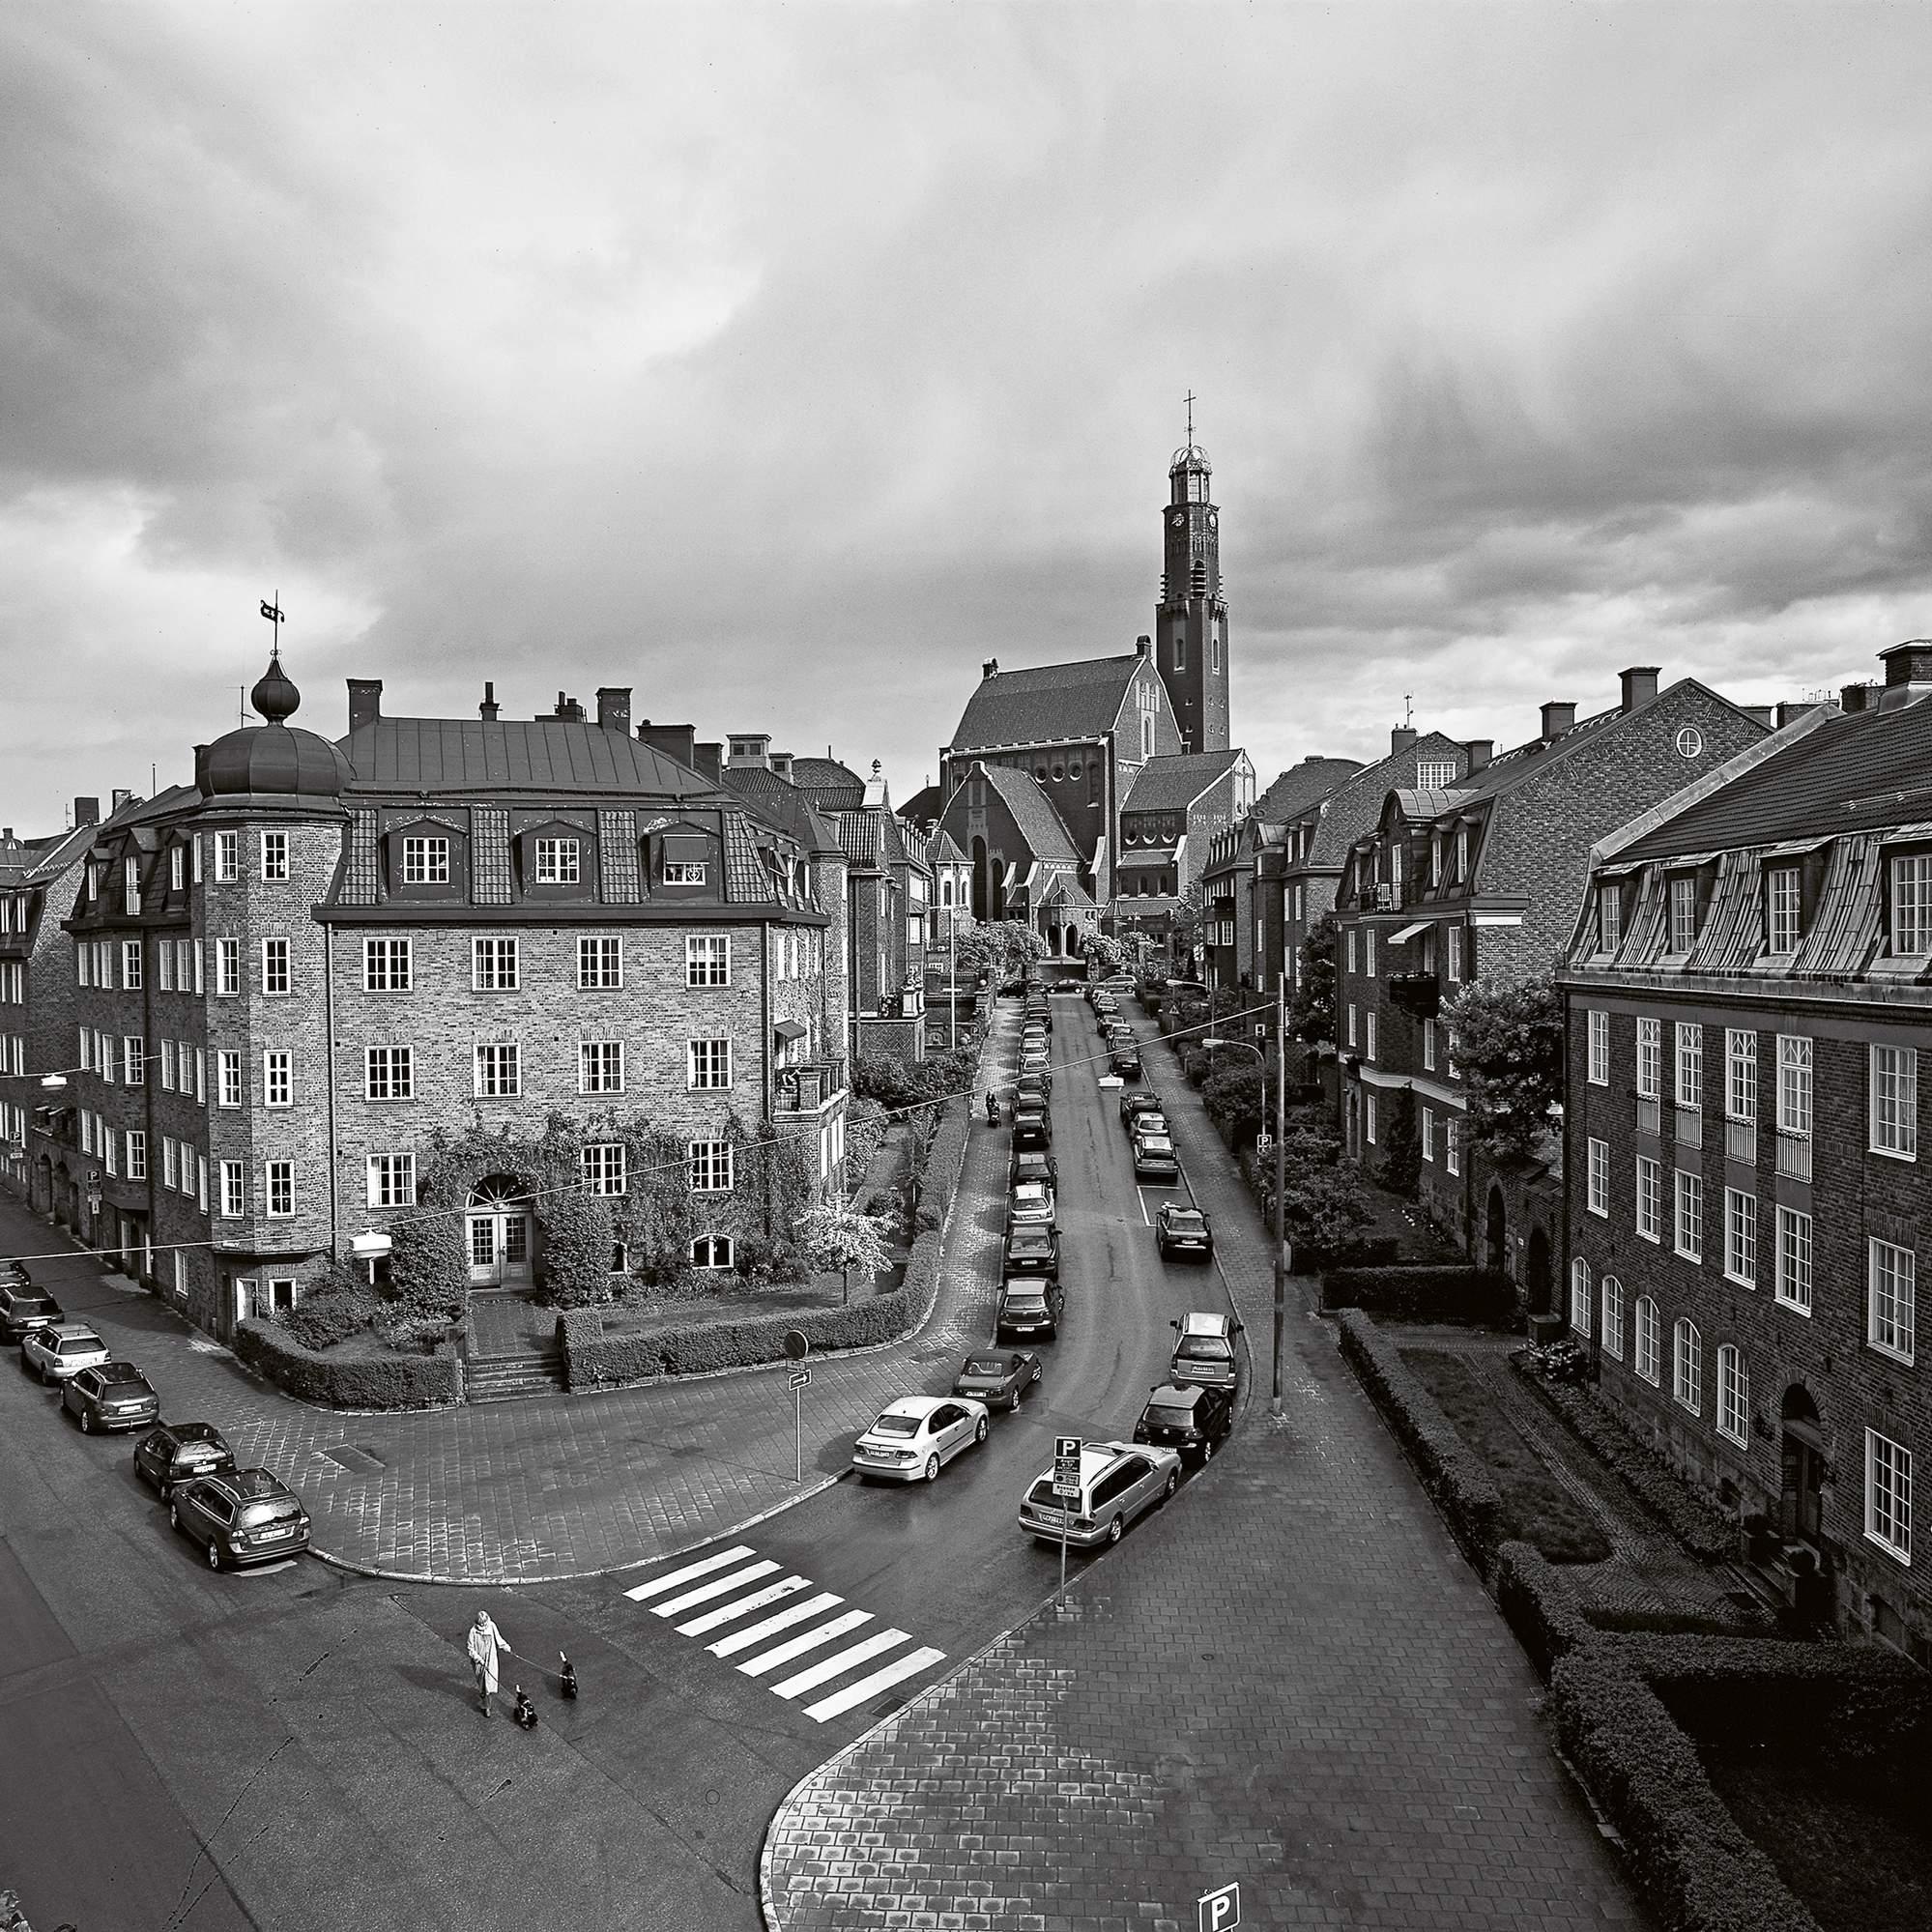 Lärkstan, Sweden